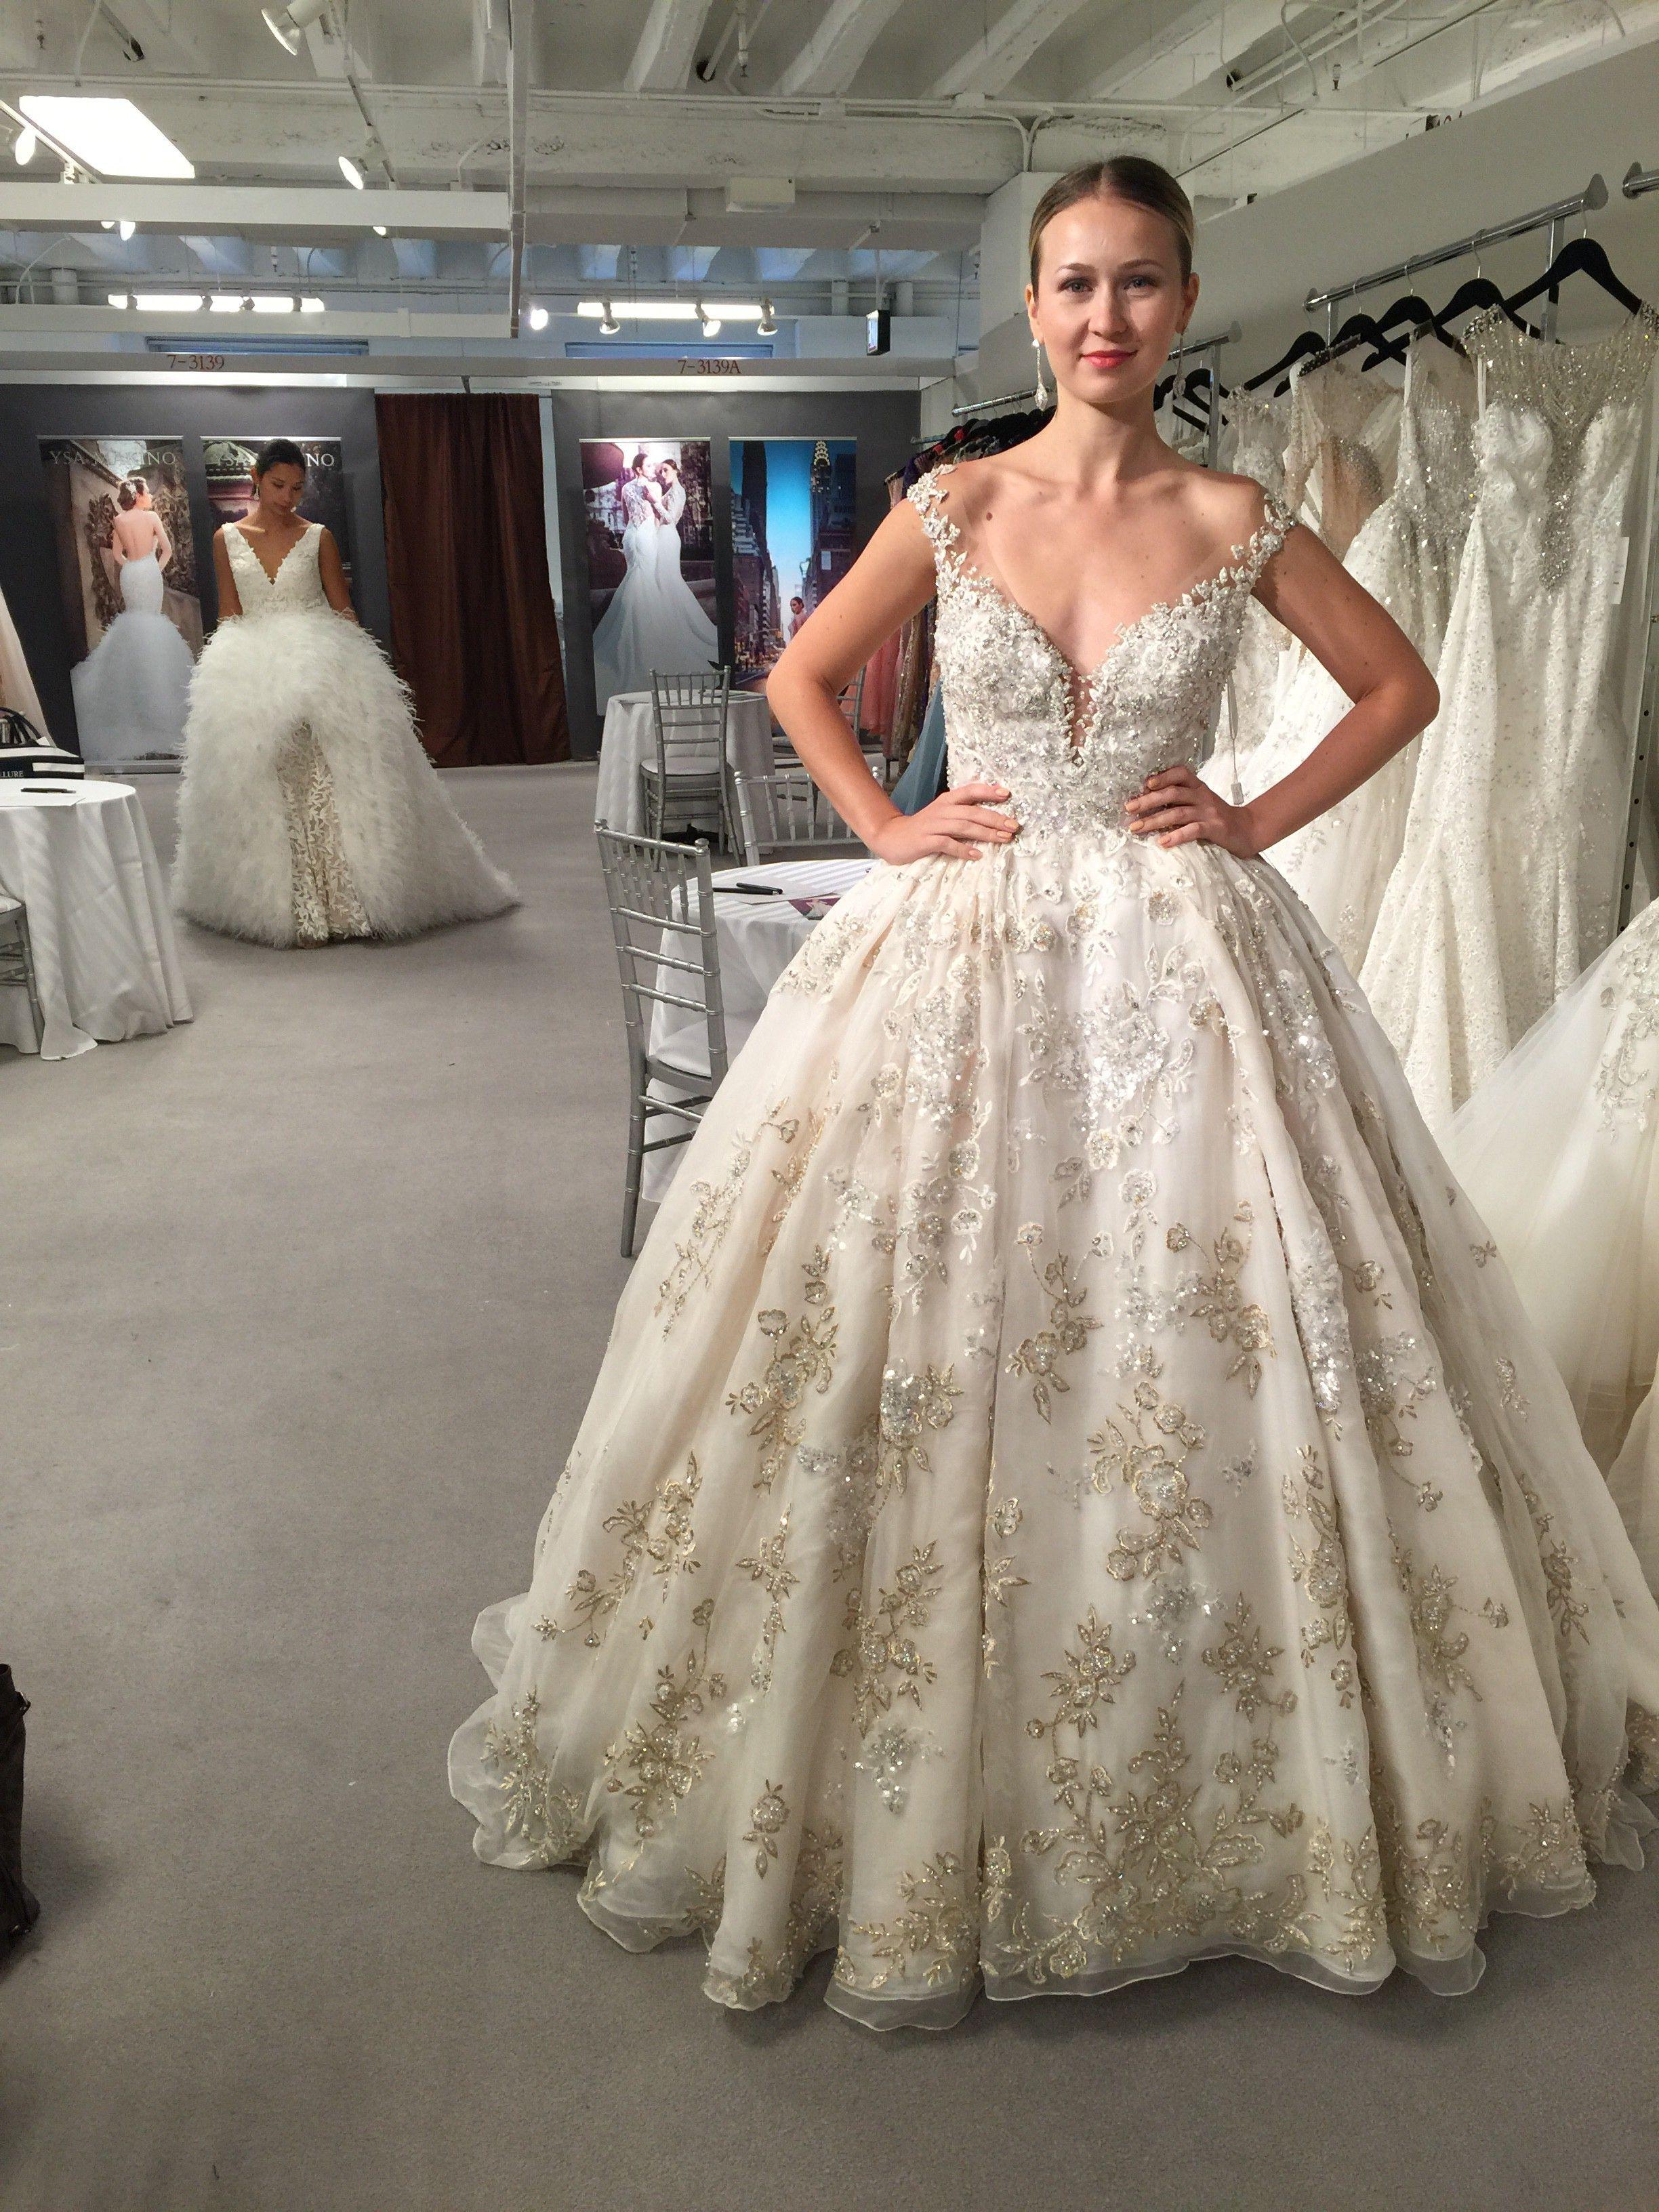 a00d4837e40f Blog | Simply Luxe Bridal Boutique Brides And Bridesmaids, Bridal Boutique,  Pretty Dresses,